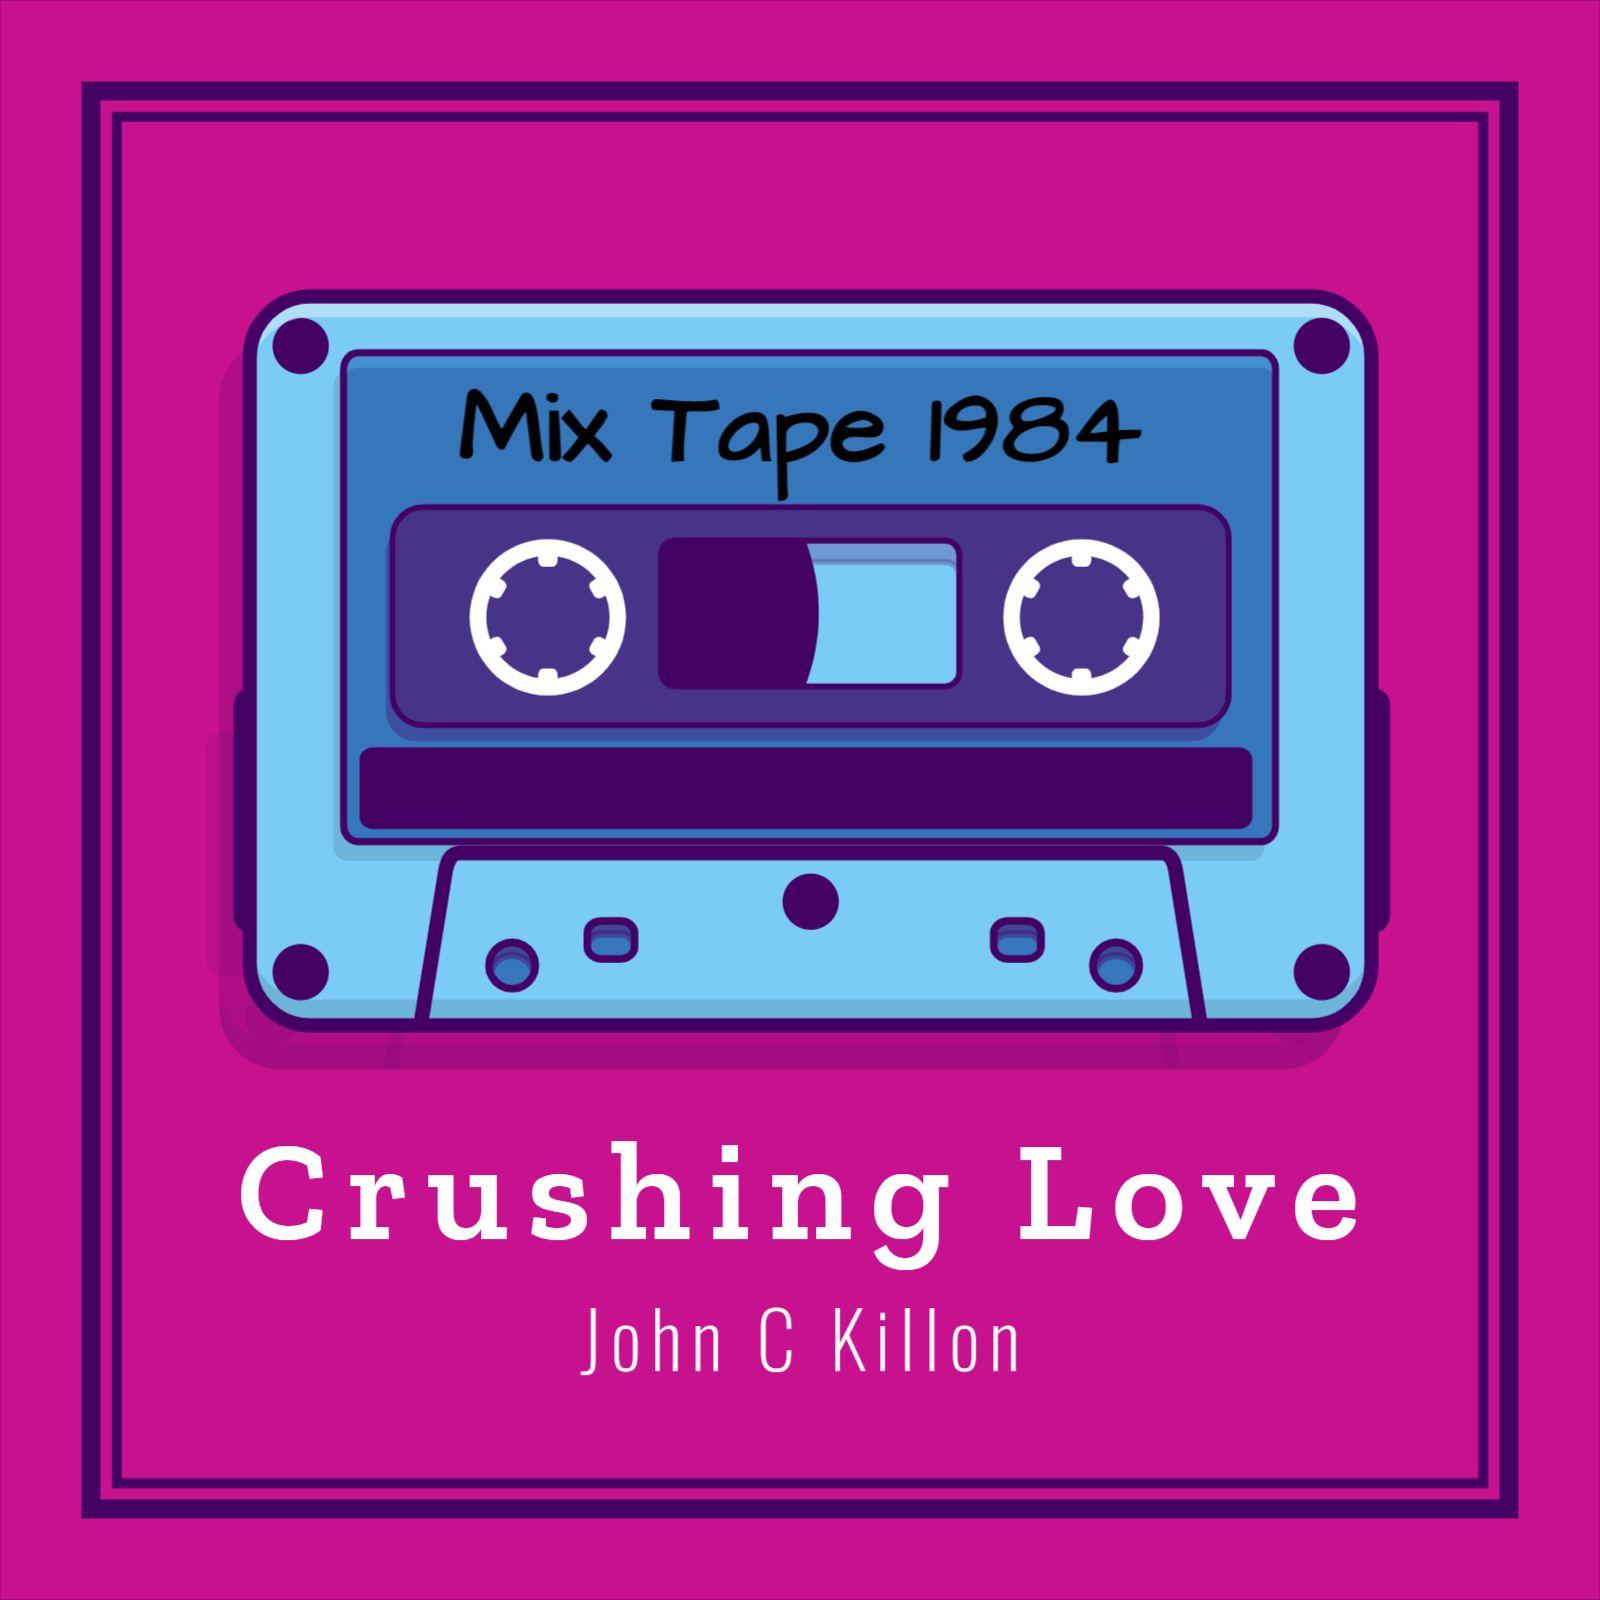 Retro Cassette Themed Album Cover Template